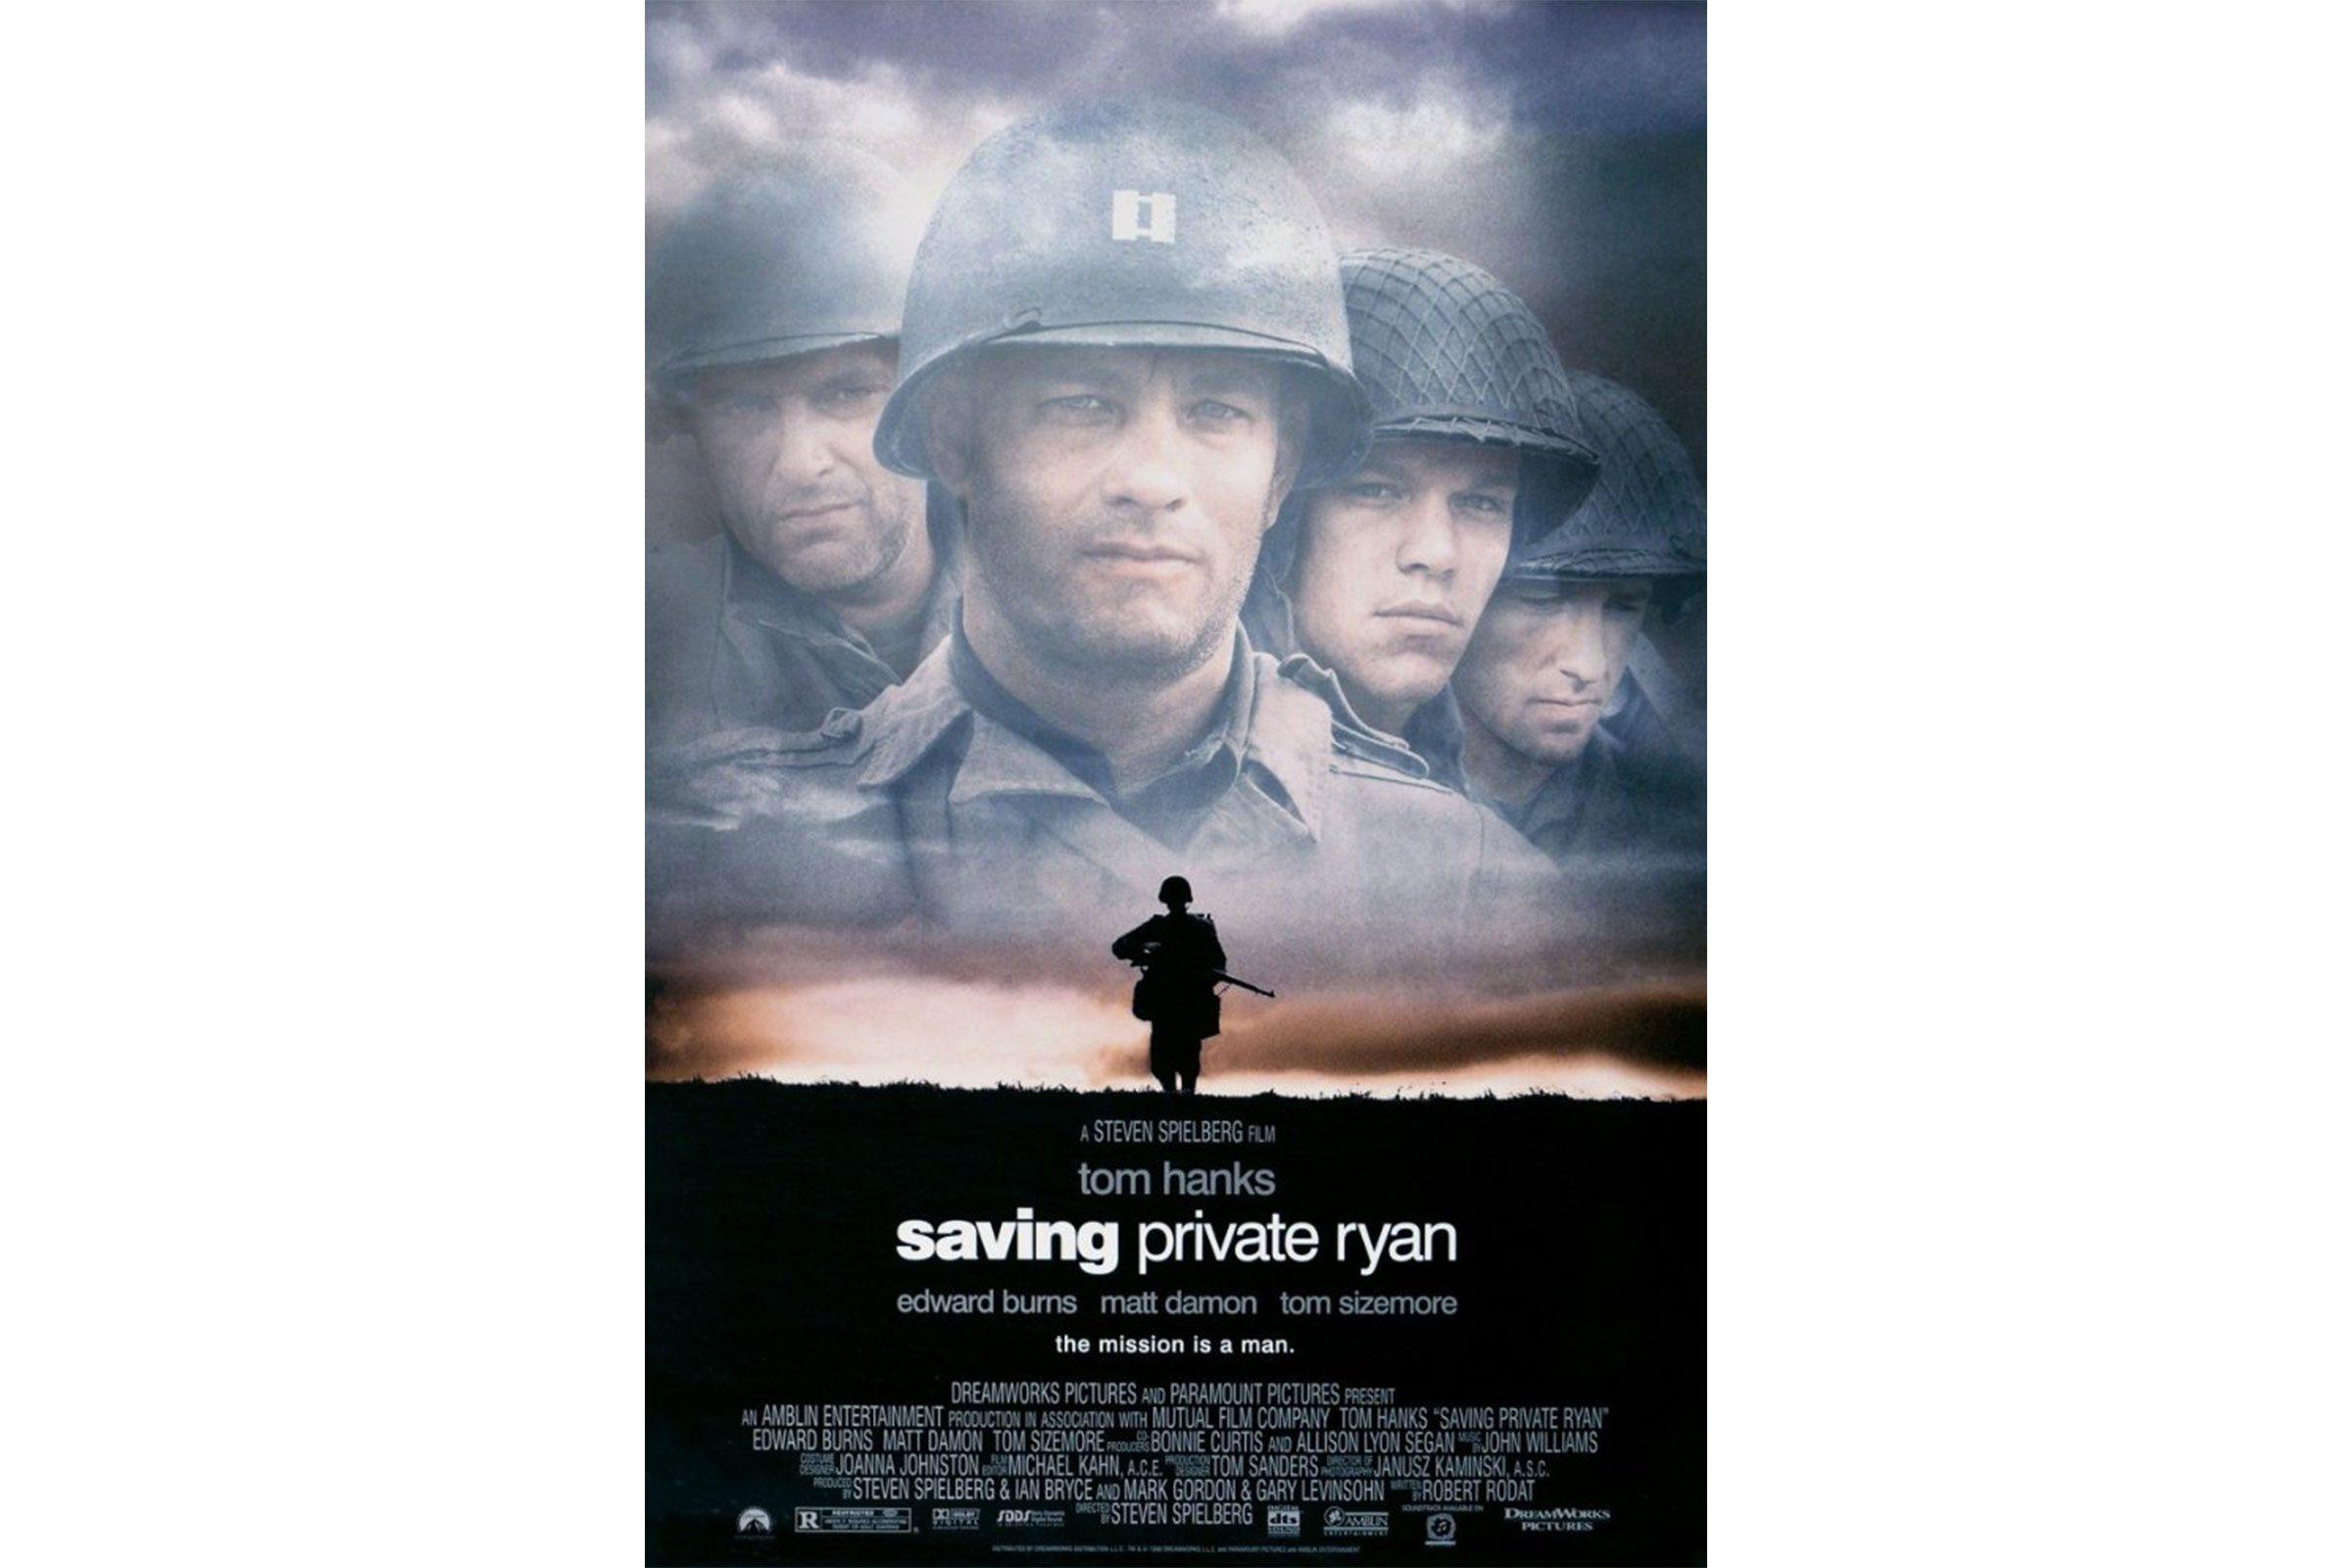 saving private rvan essay